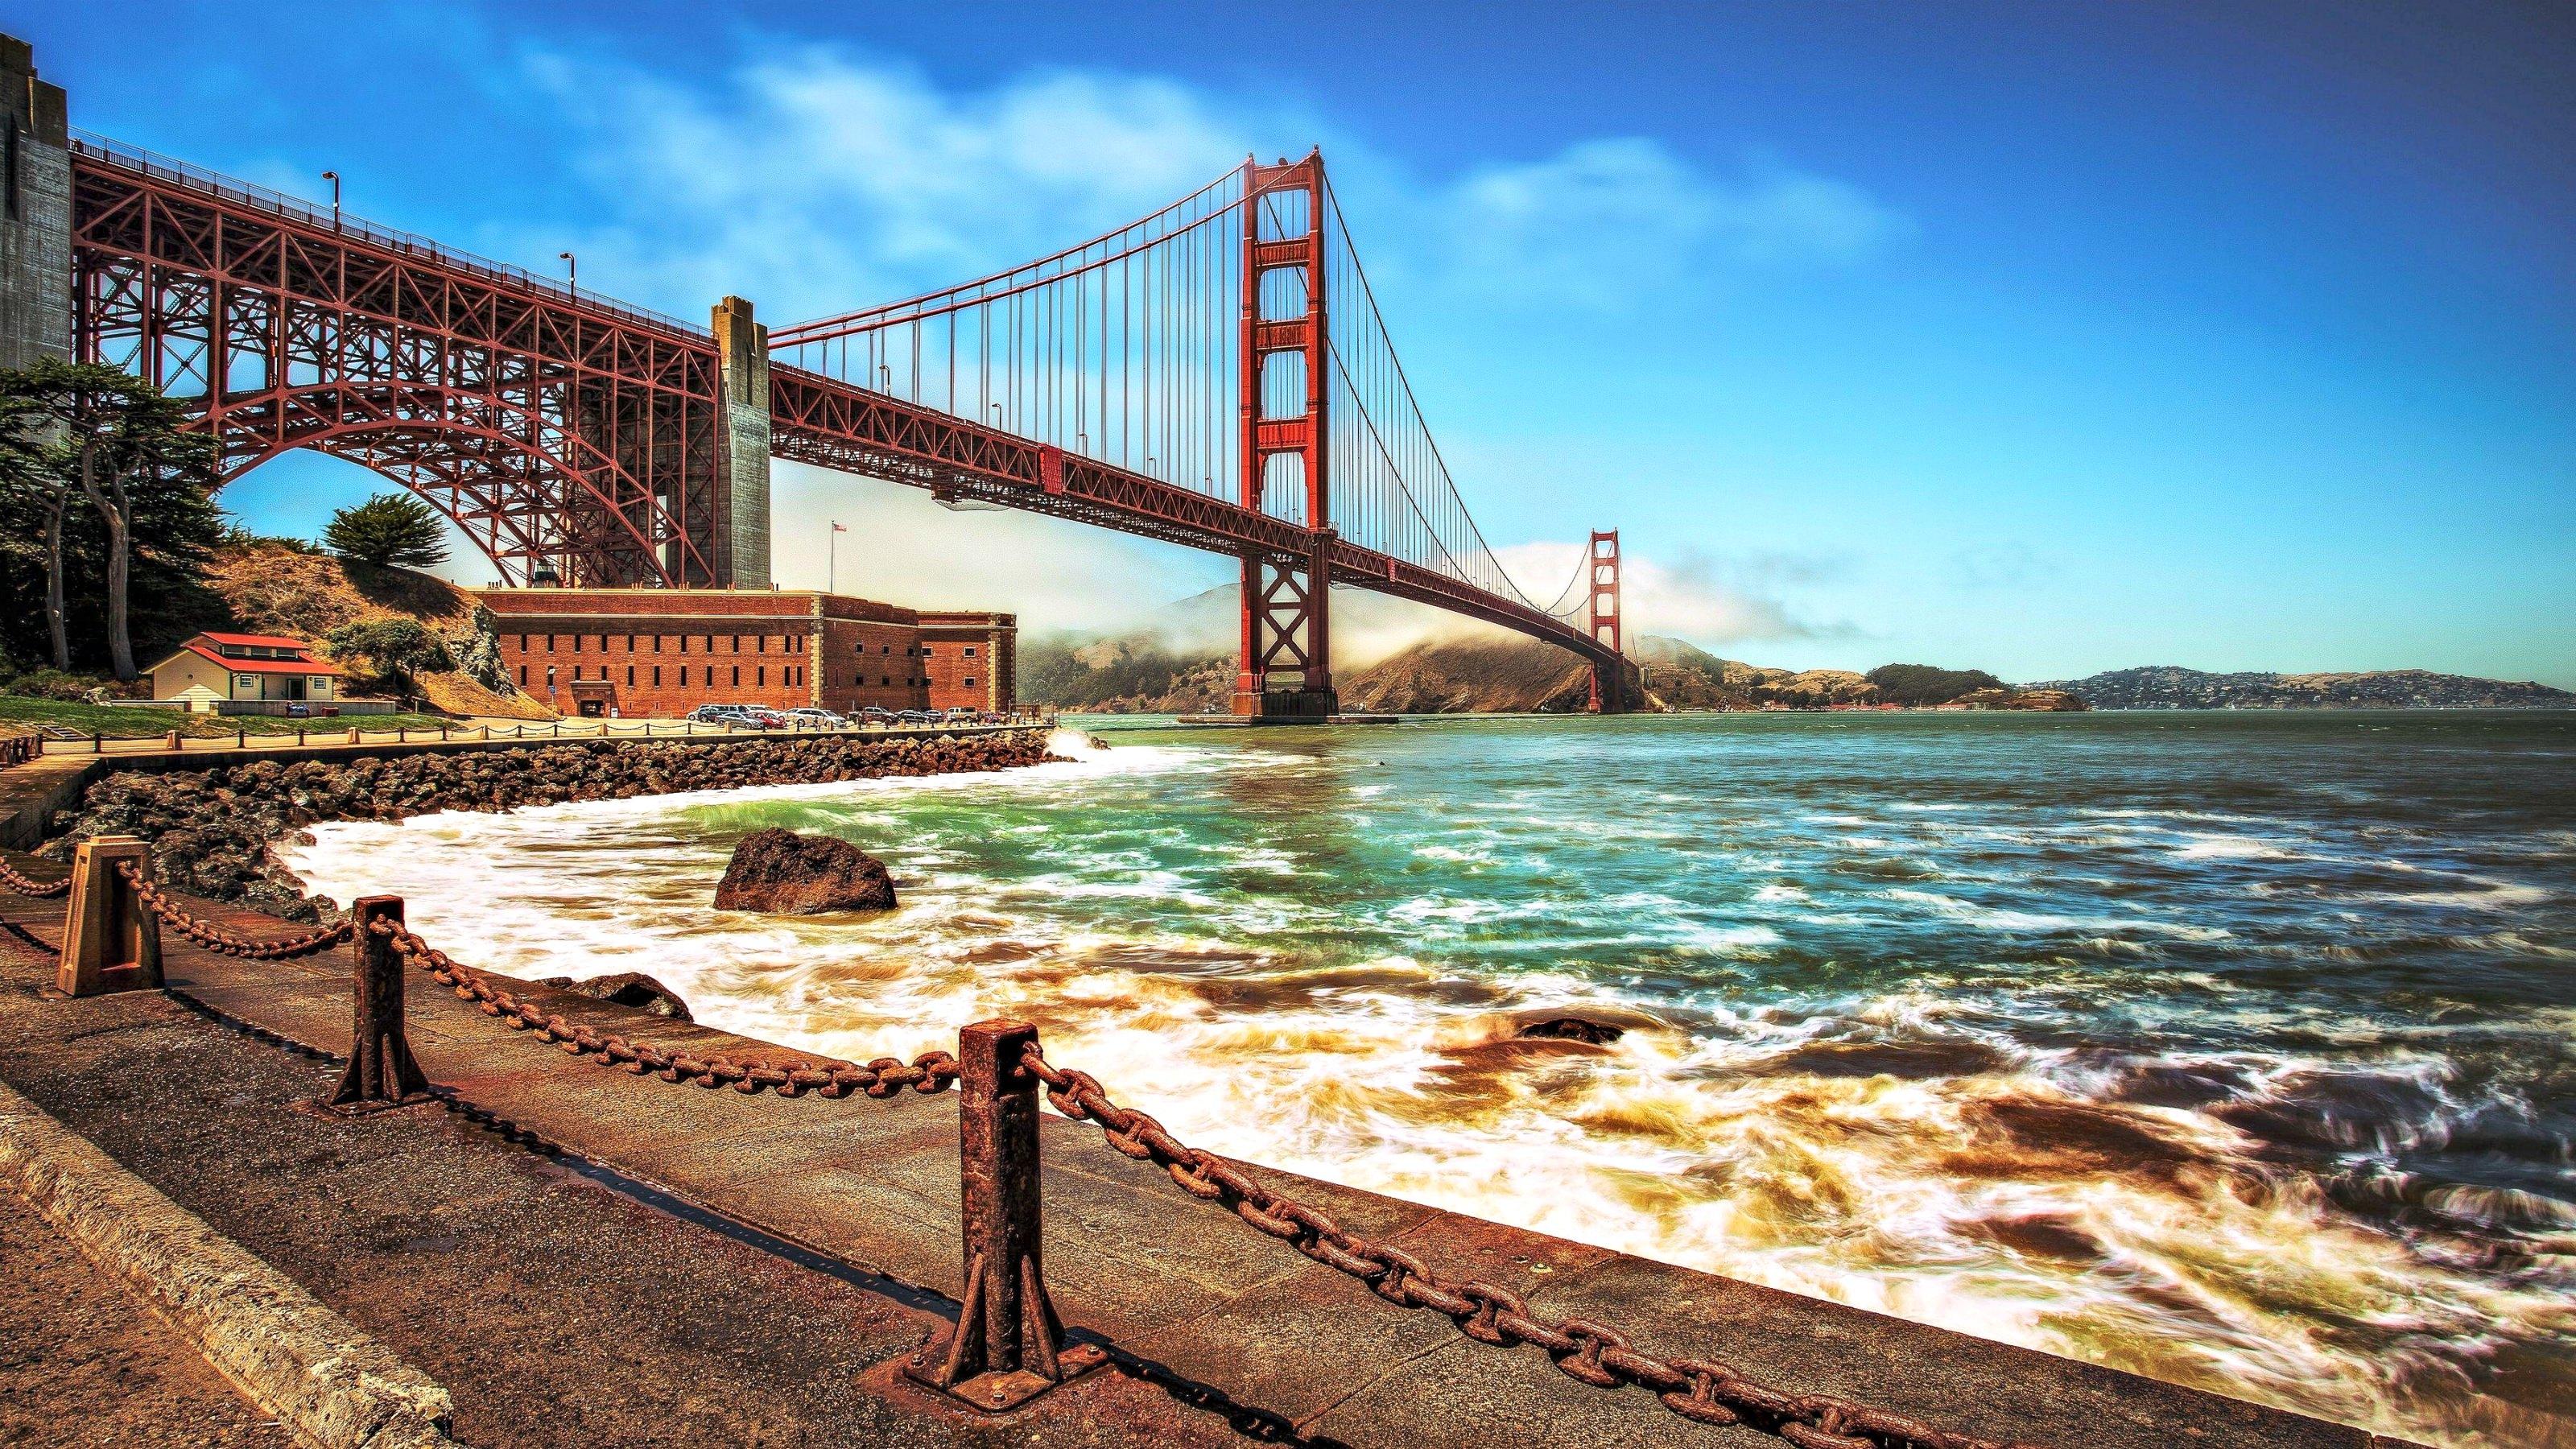 48 Golden Gate Bridge Wallpaper Desktop On Wallpapersafari